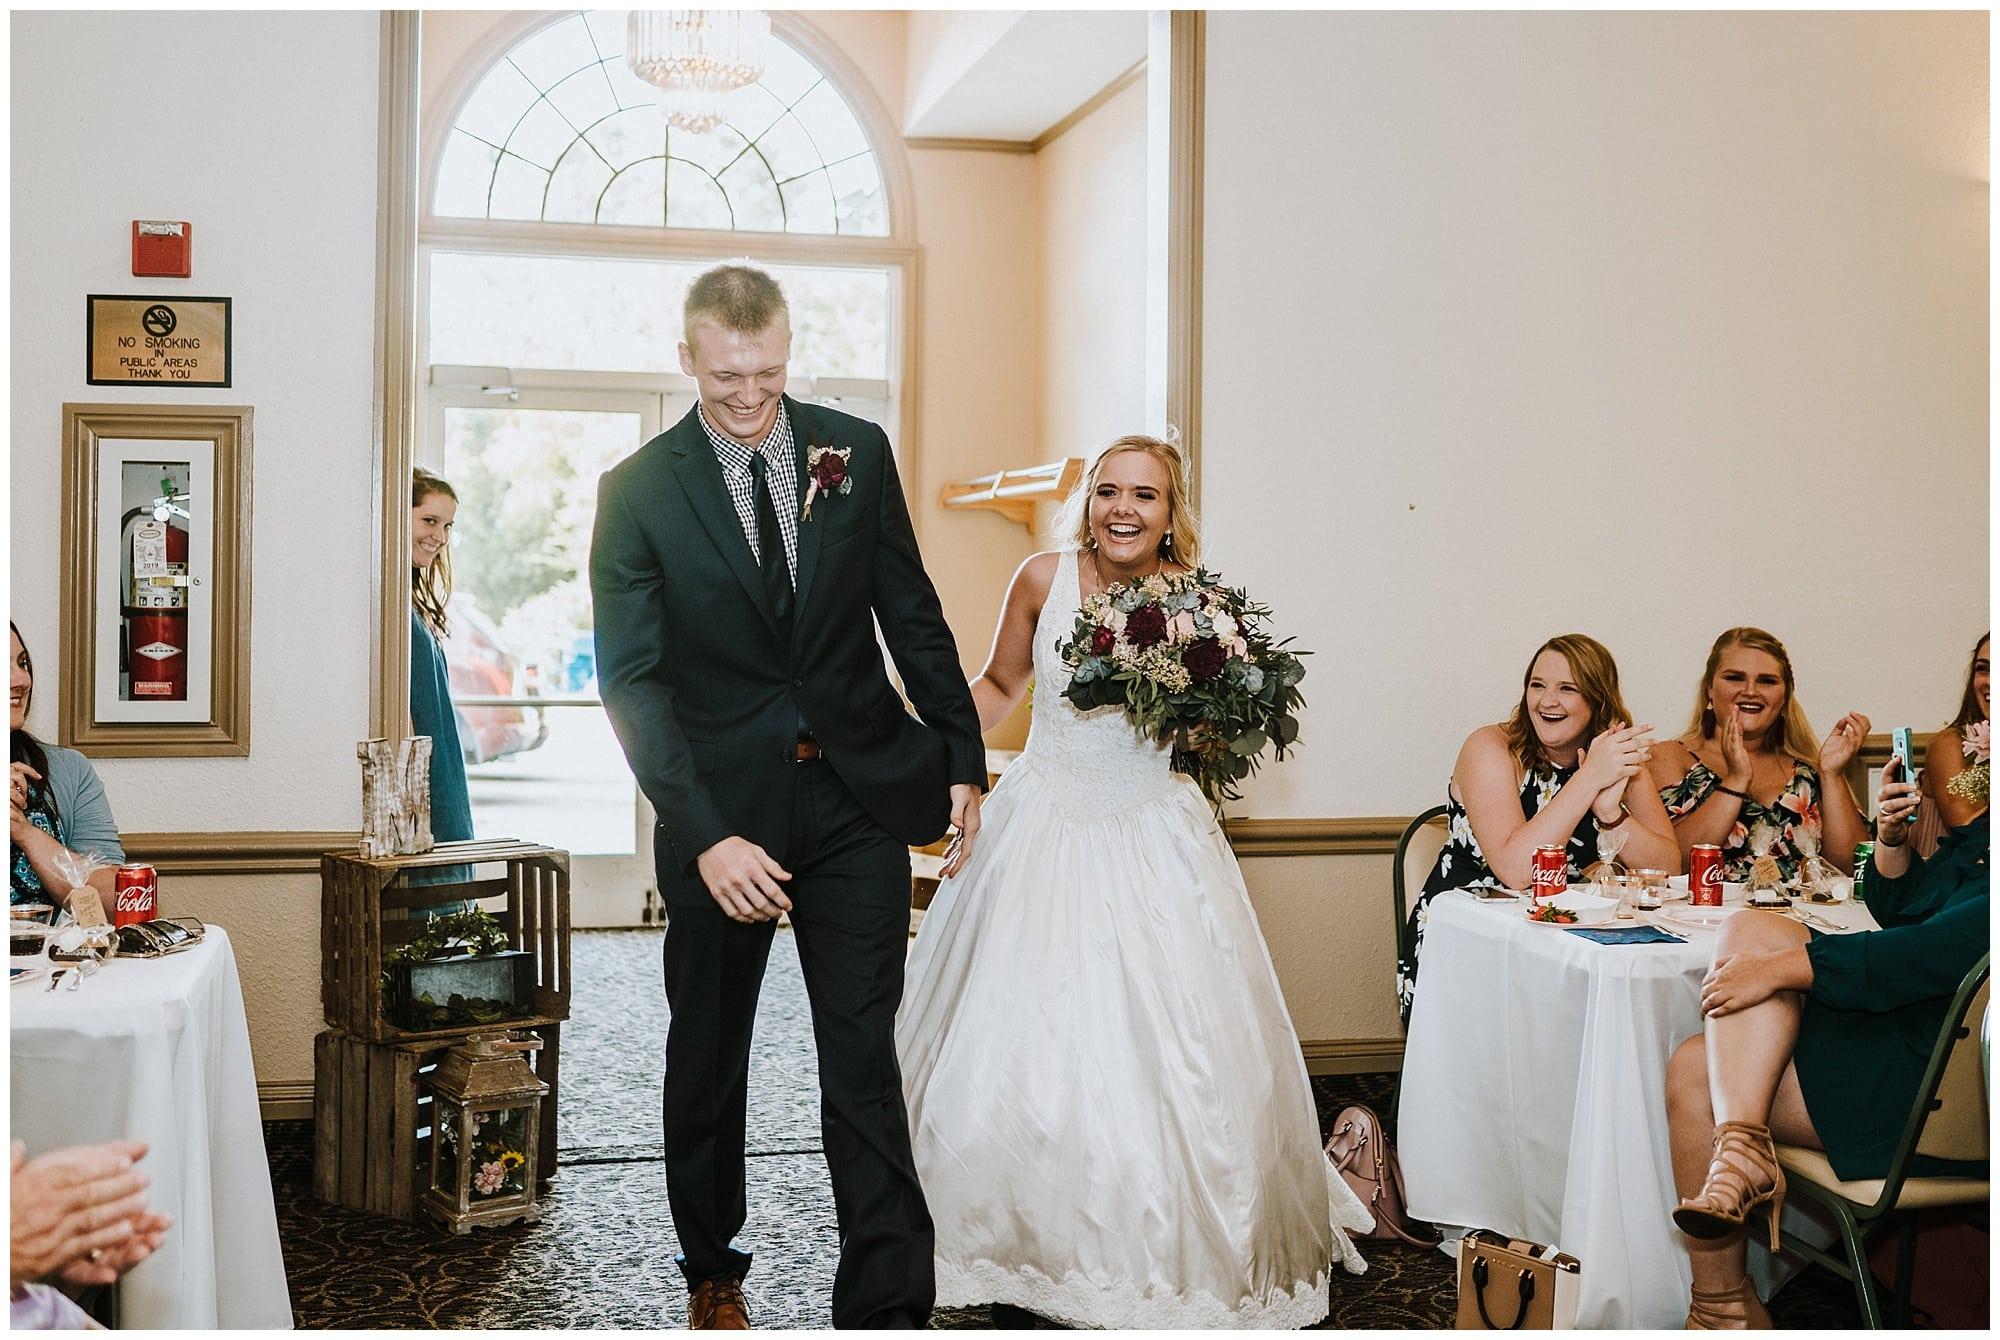 Adrian Michigan Wedding Photographer-104.JPG